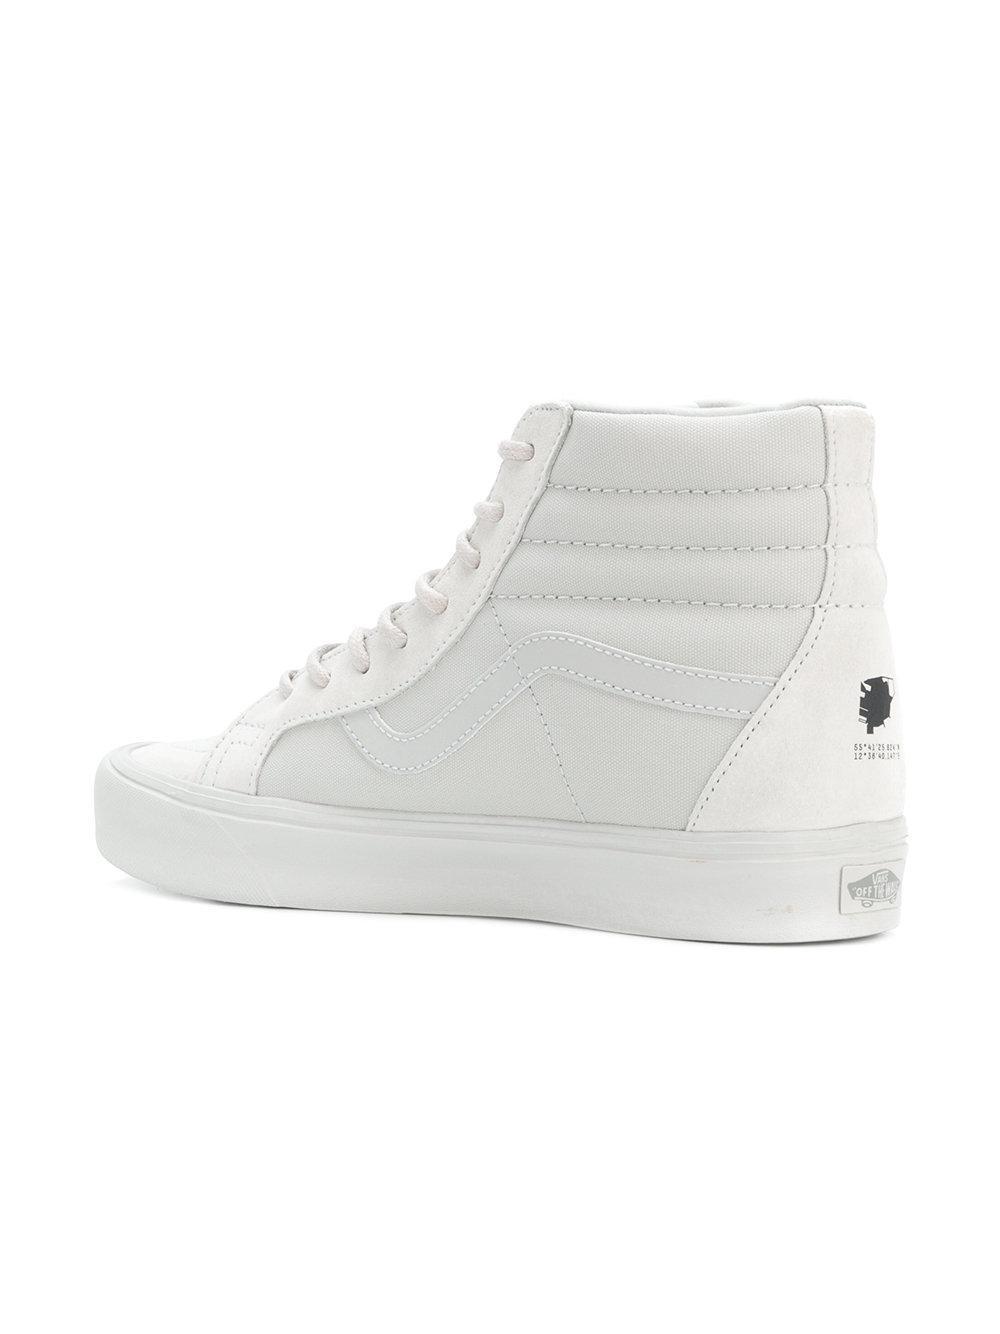 eb6976d743fc2c Lyst - Vans Sk8-hi Lite Sneakers in White for Men